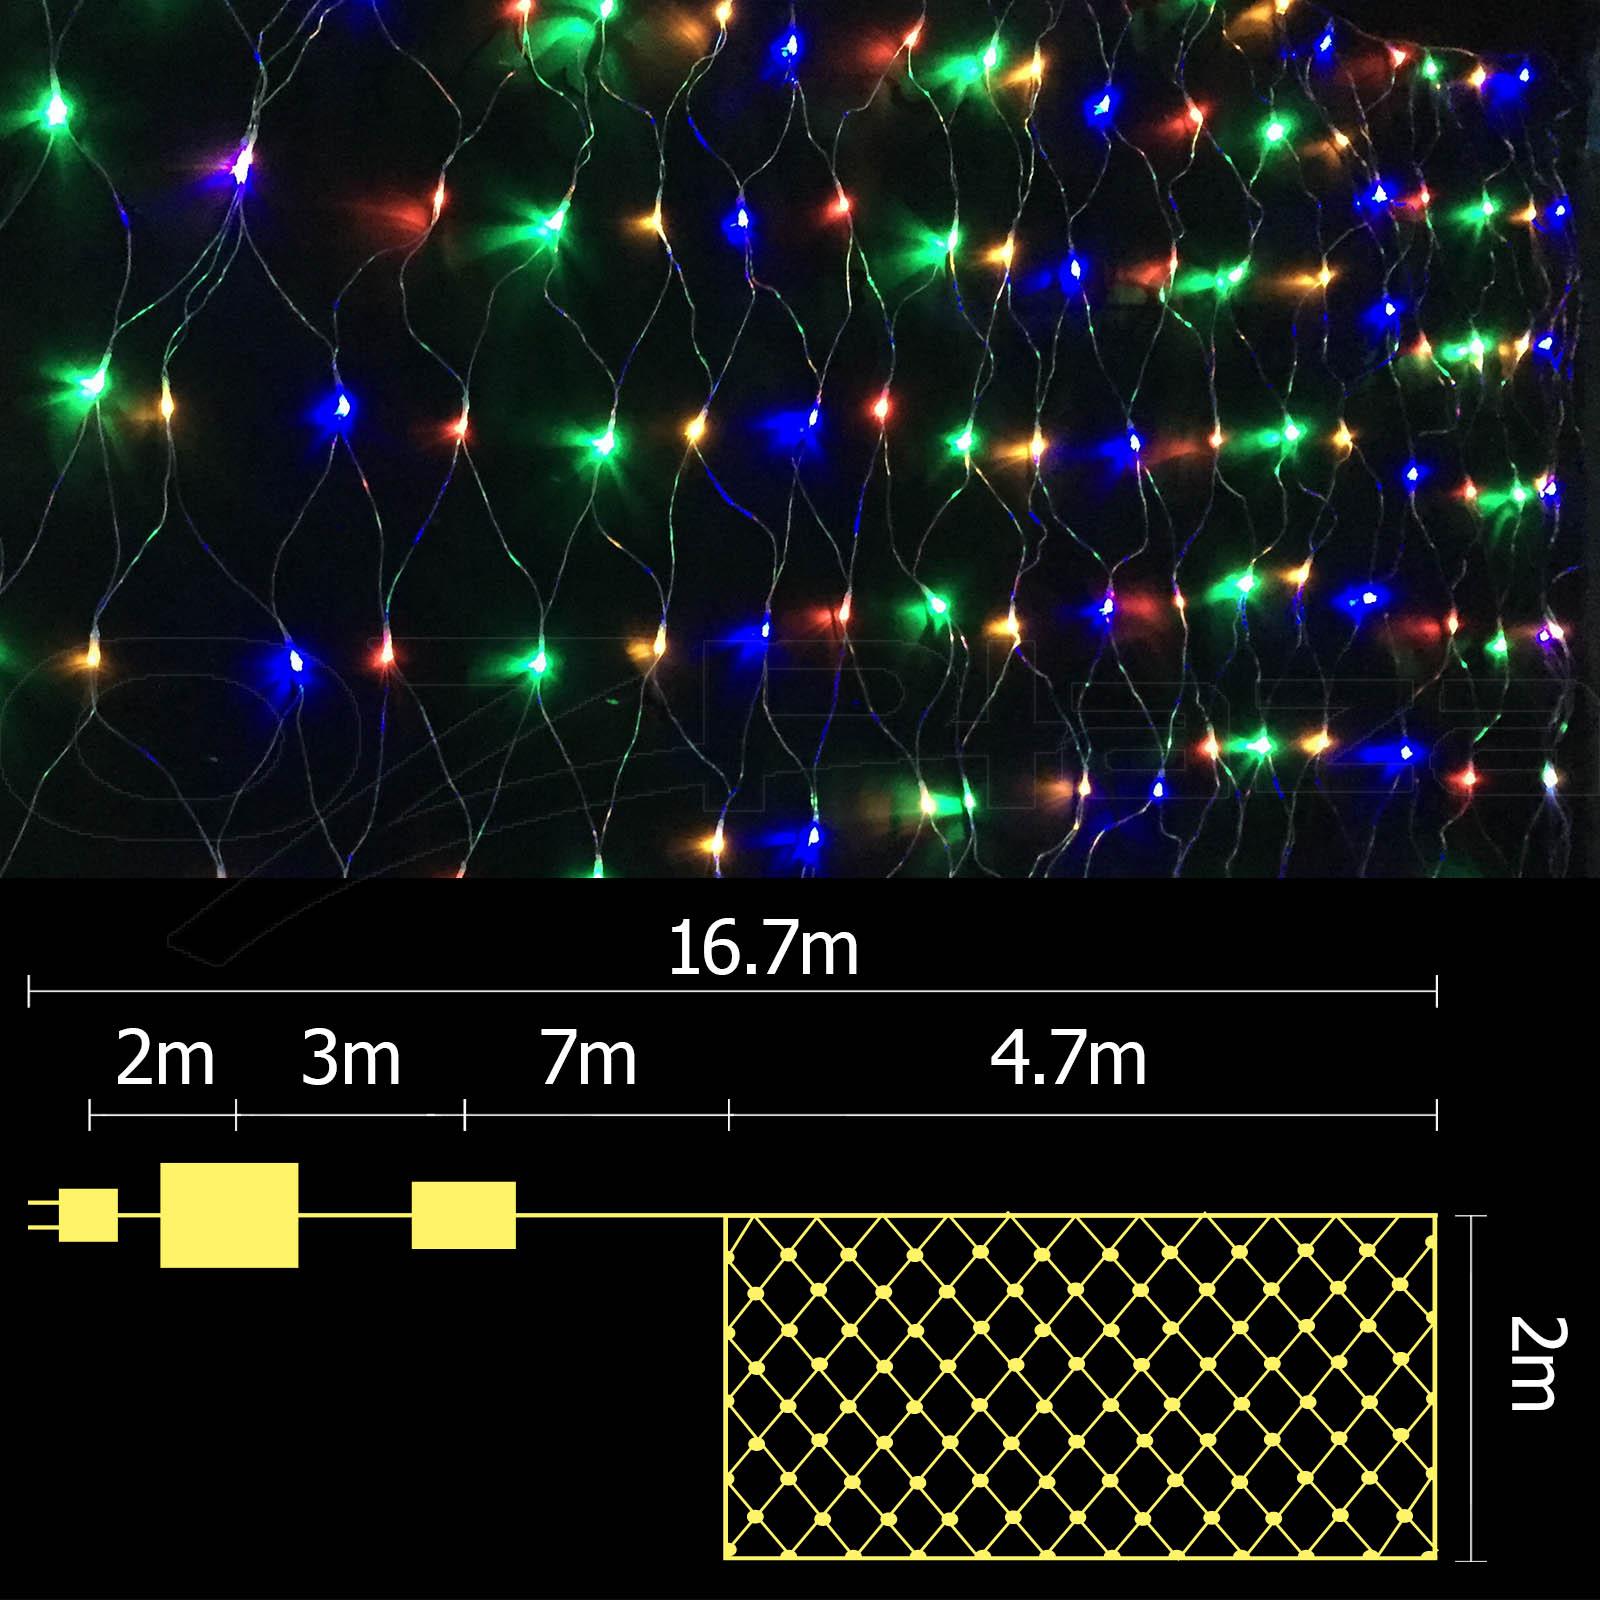 400 LED Christmas Net Lights Display Outdoor Fairy Party Wedding Lighting Ici